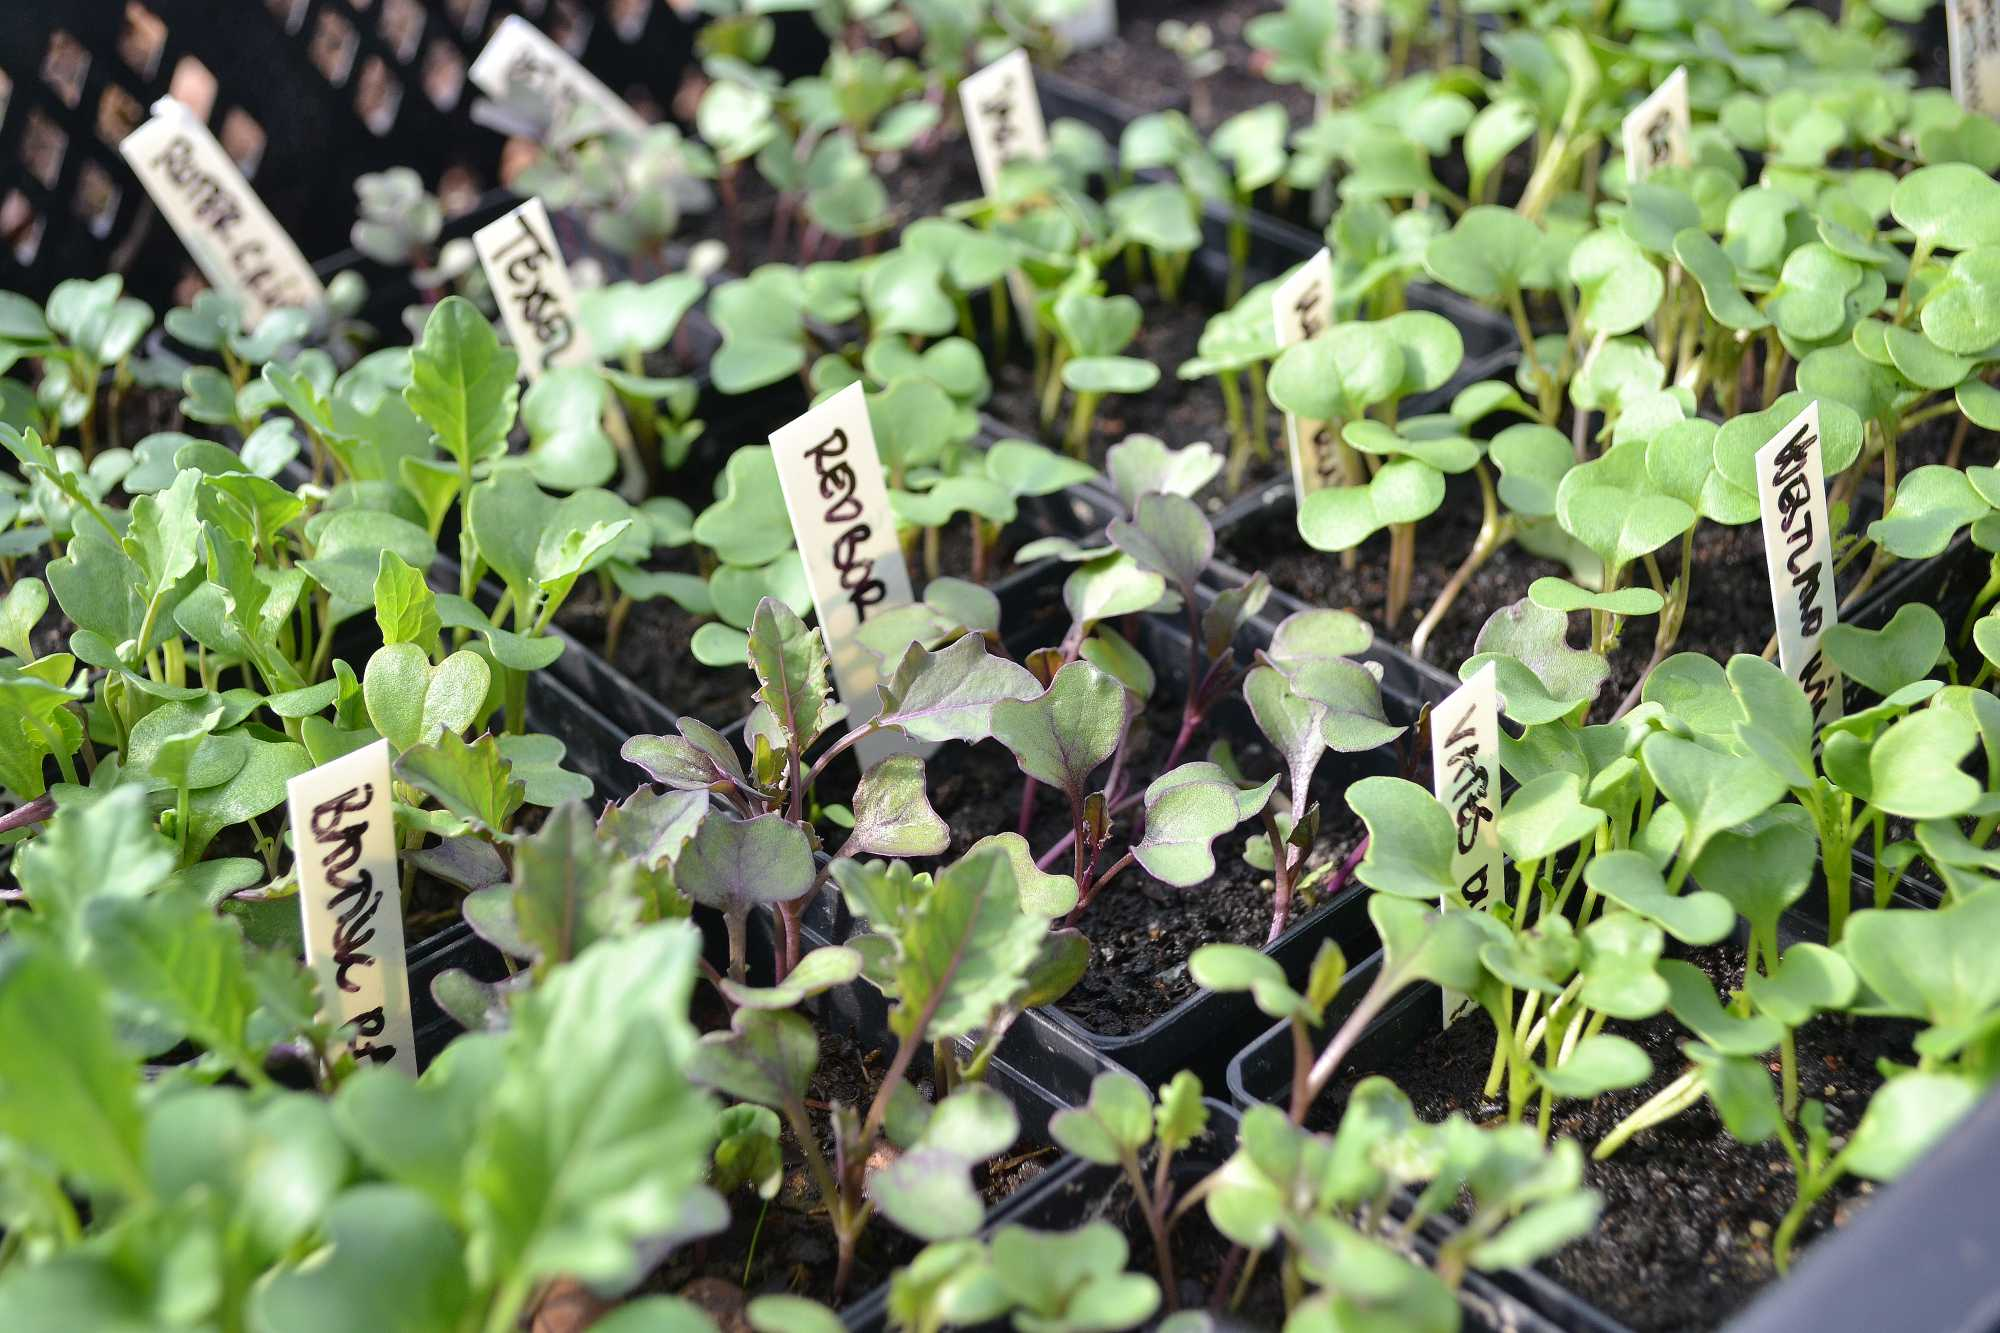 Massa små kålplantor i krukor.